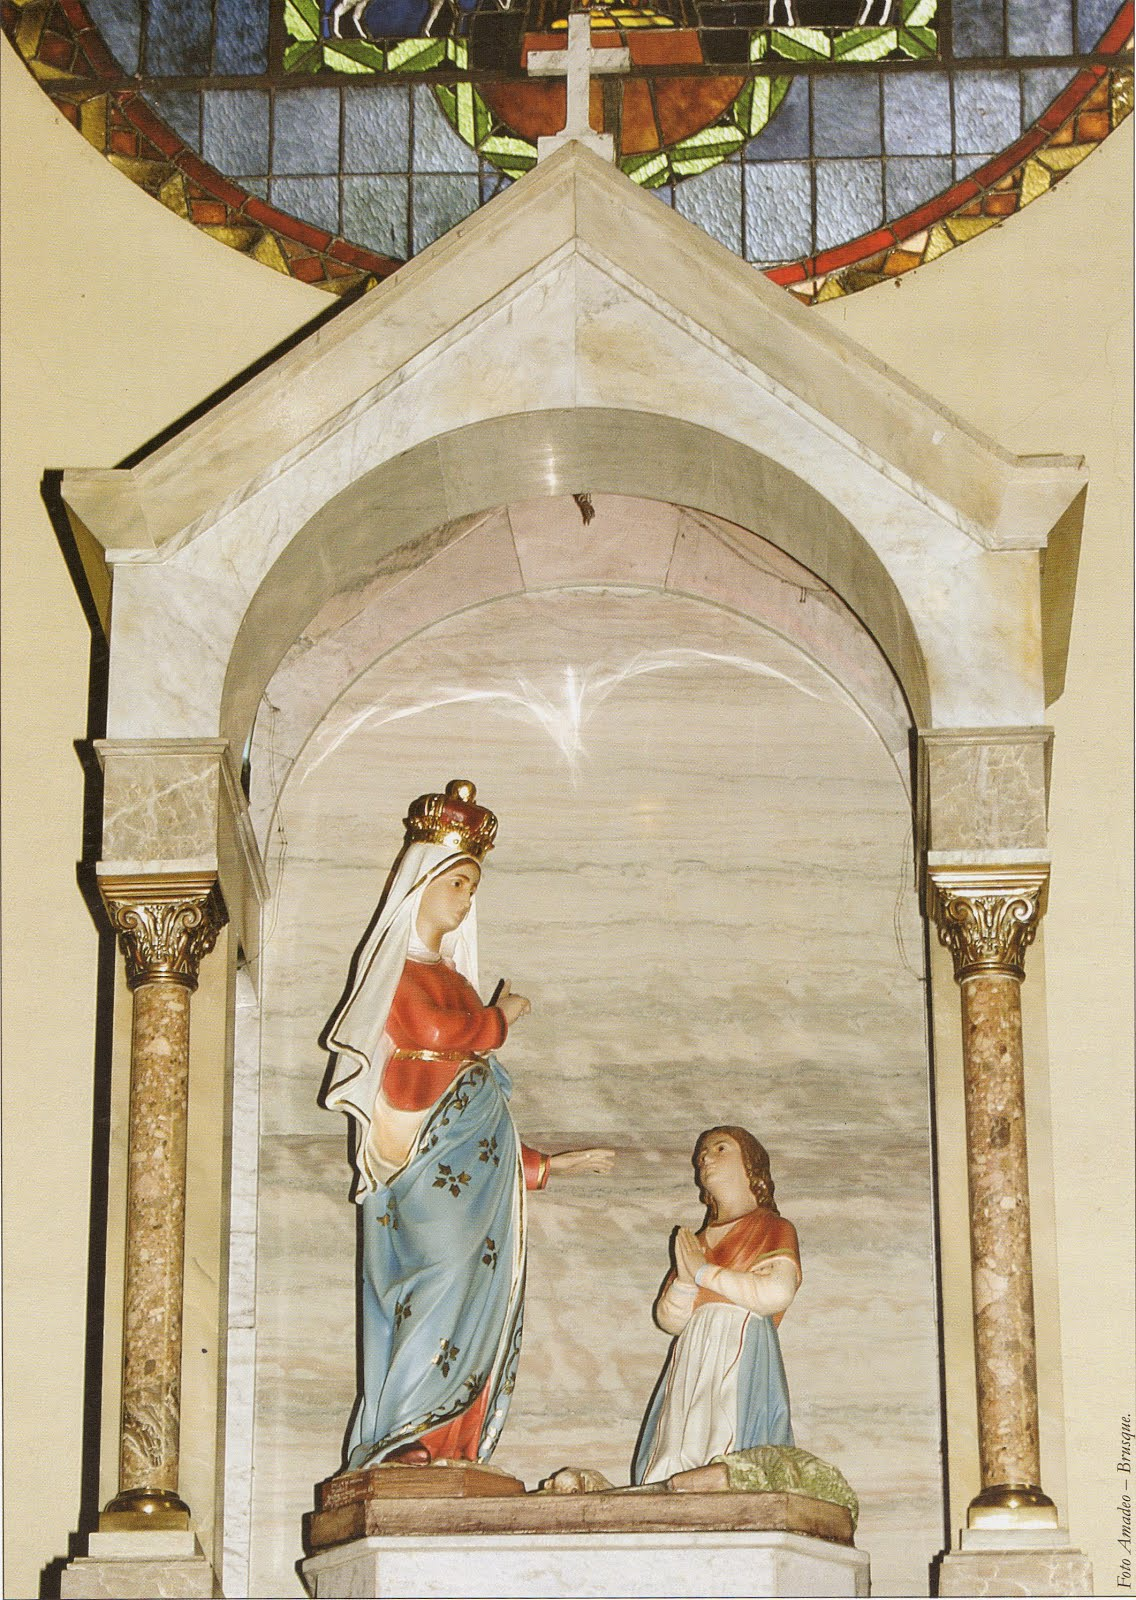 Nossa Senhora de Caravaggio de Azambuja